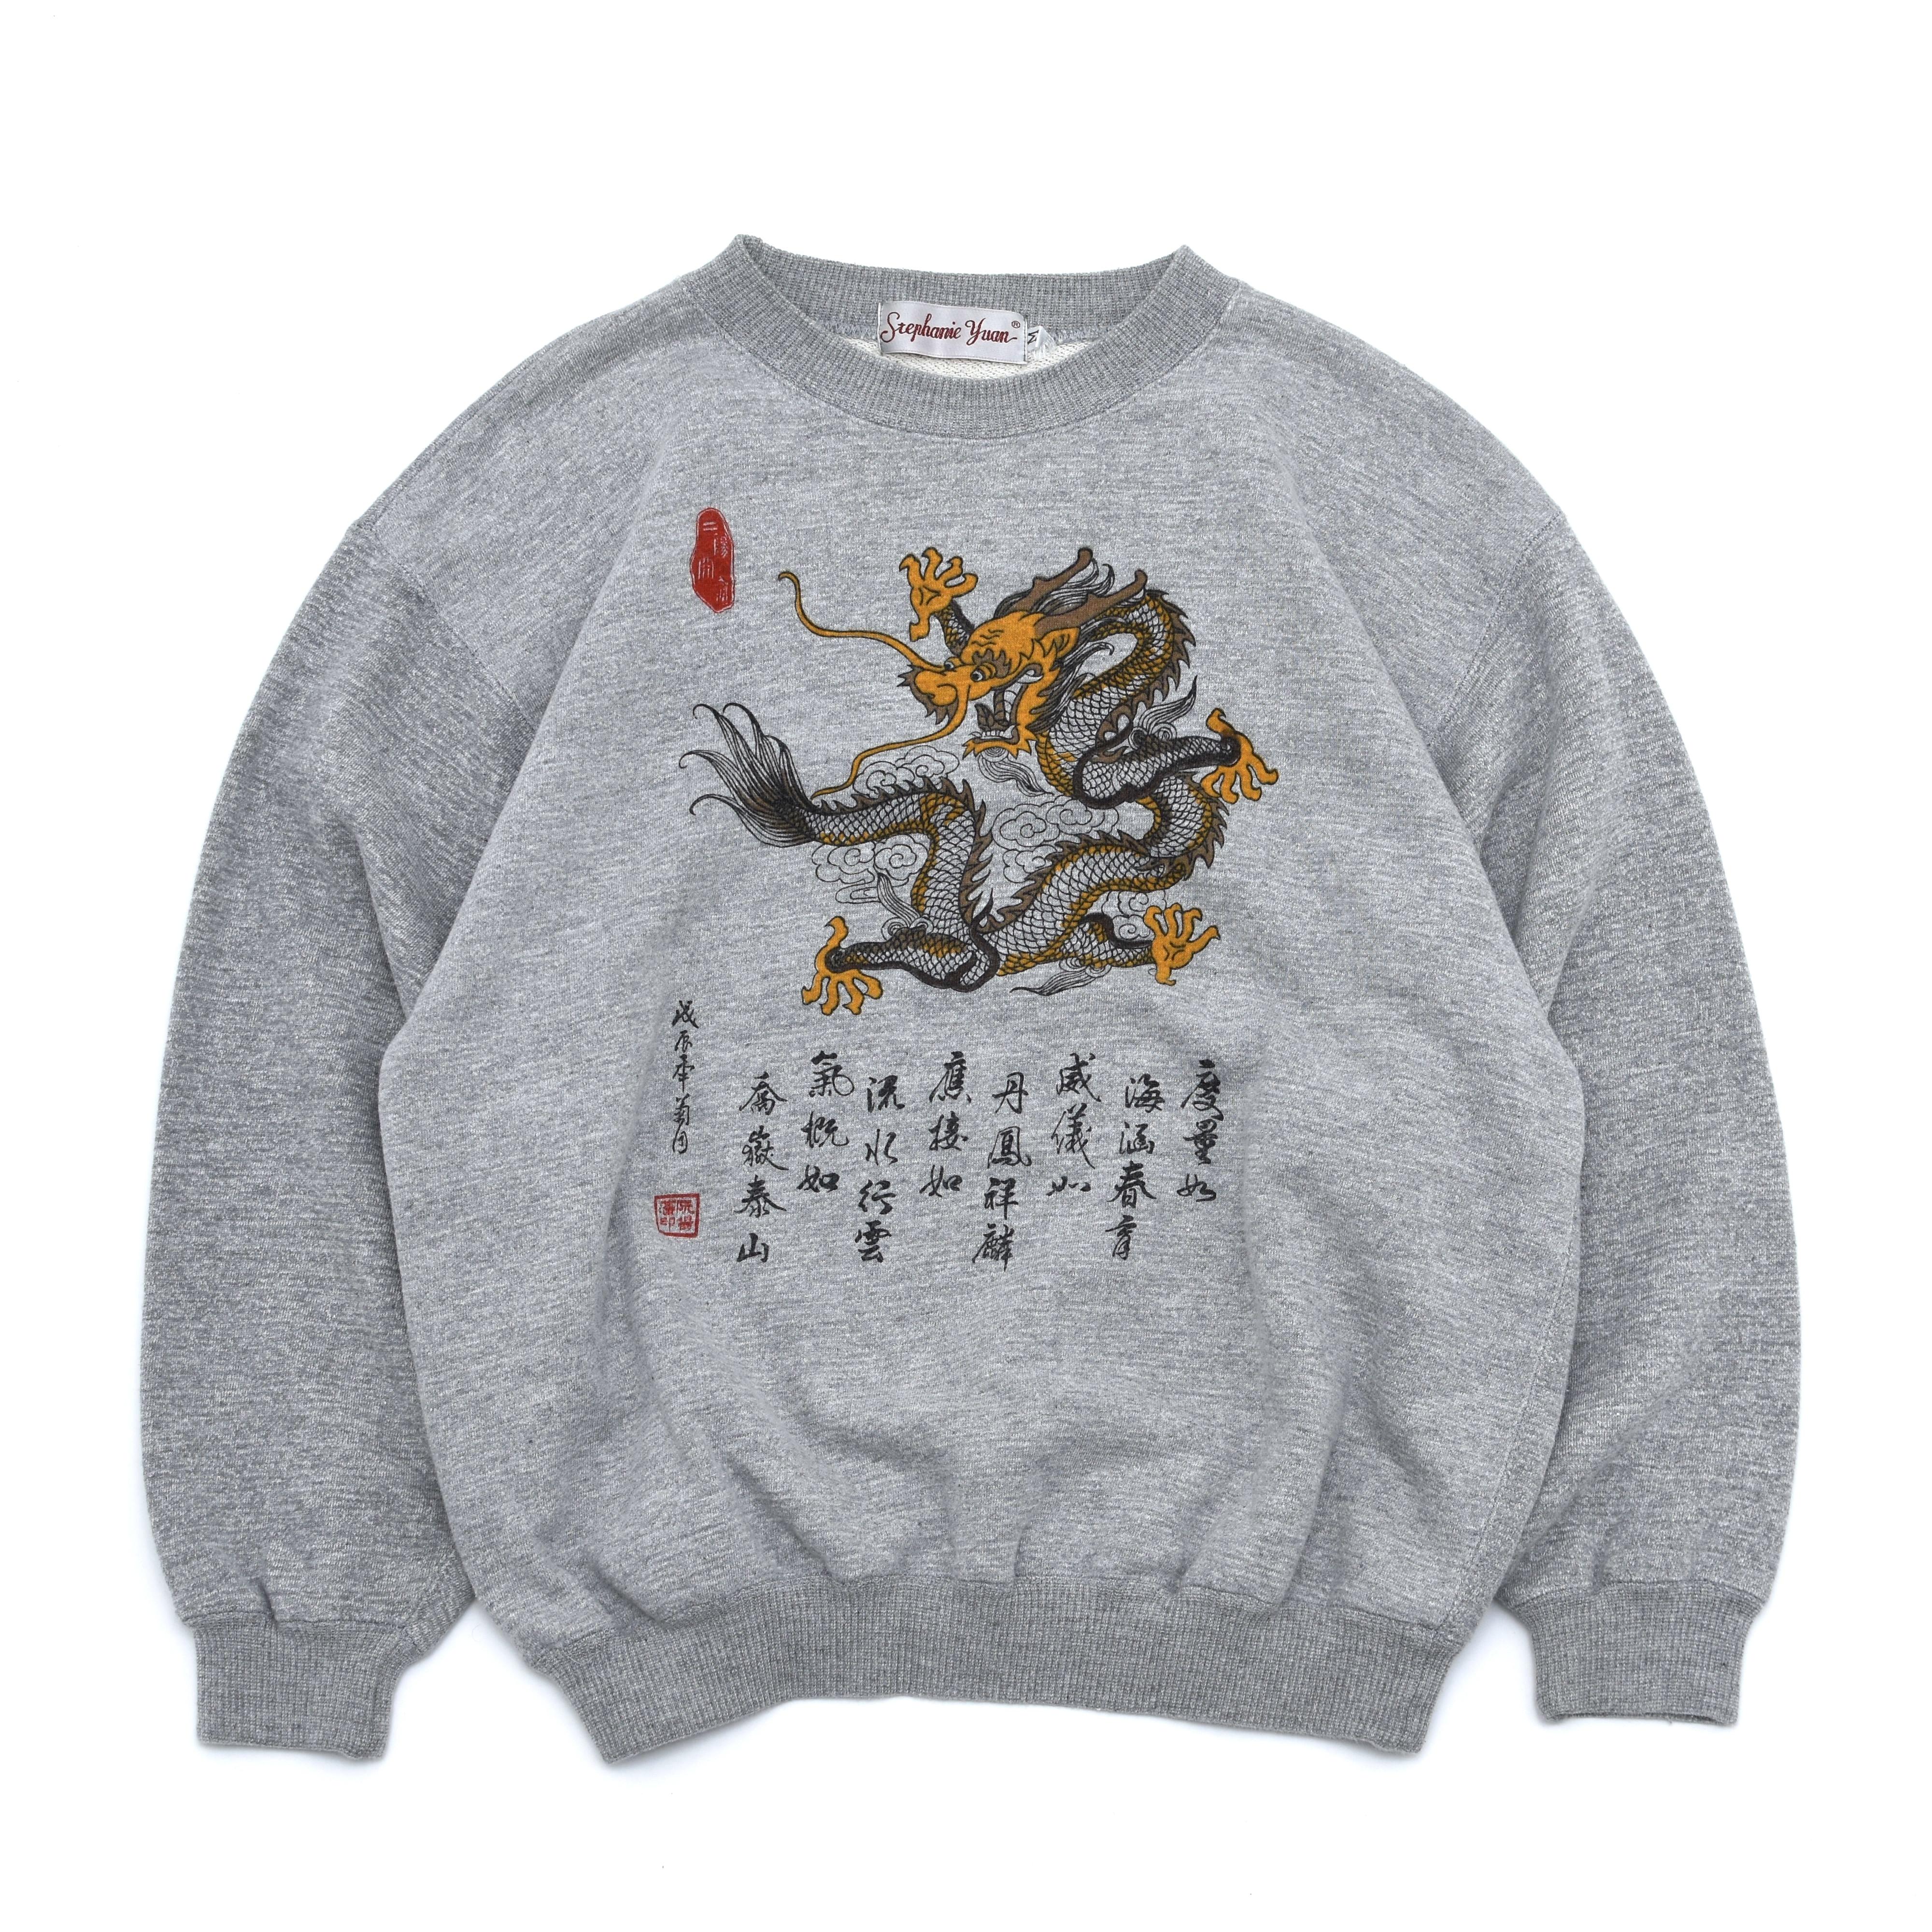 Dragon & Chinese writing print sweatshirt